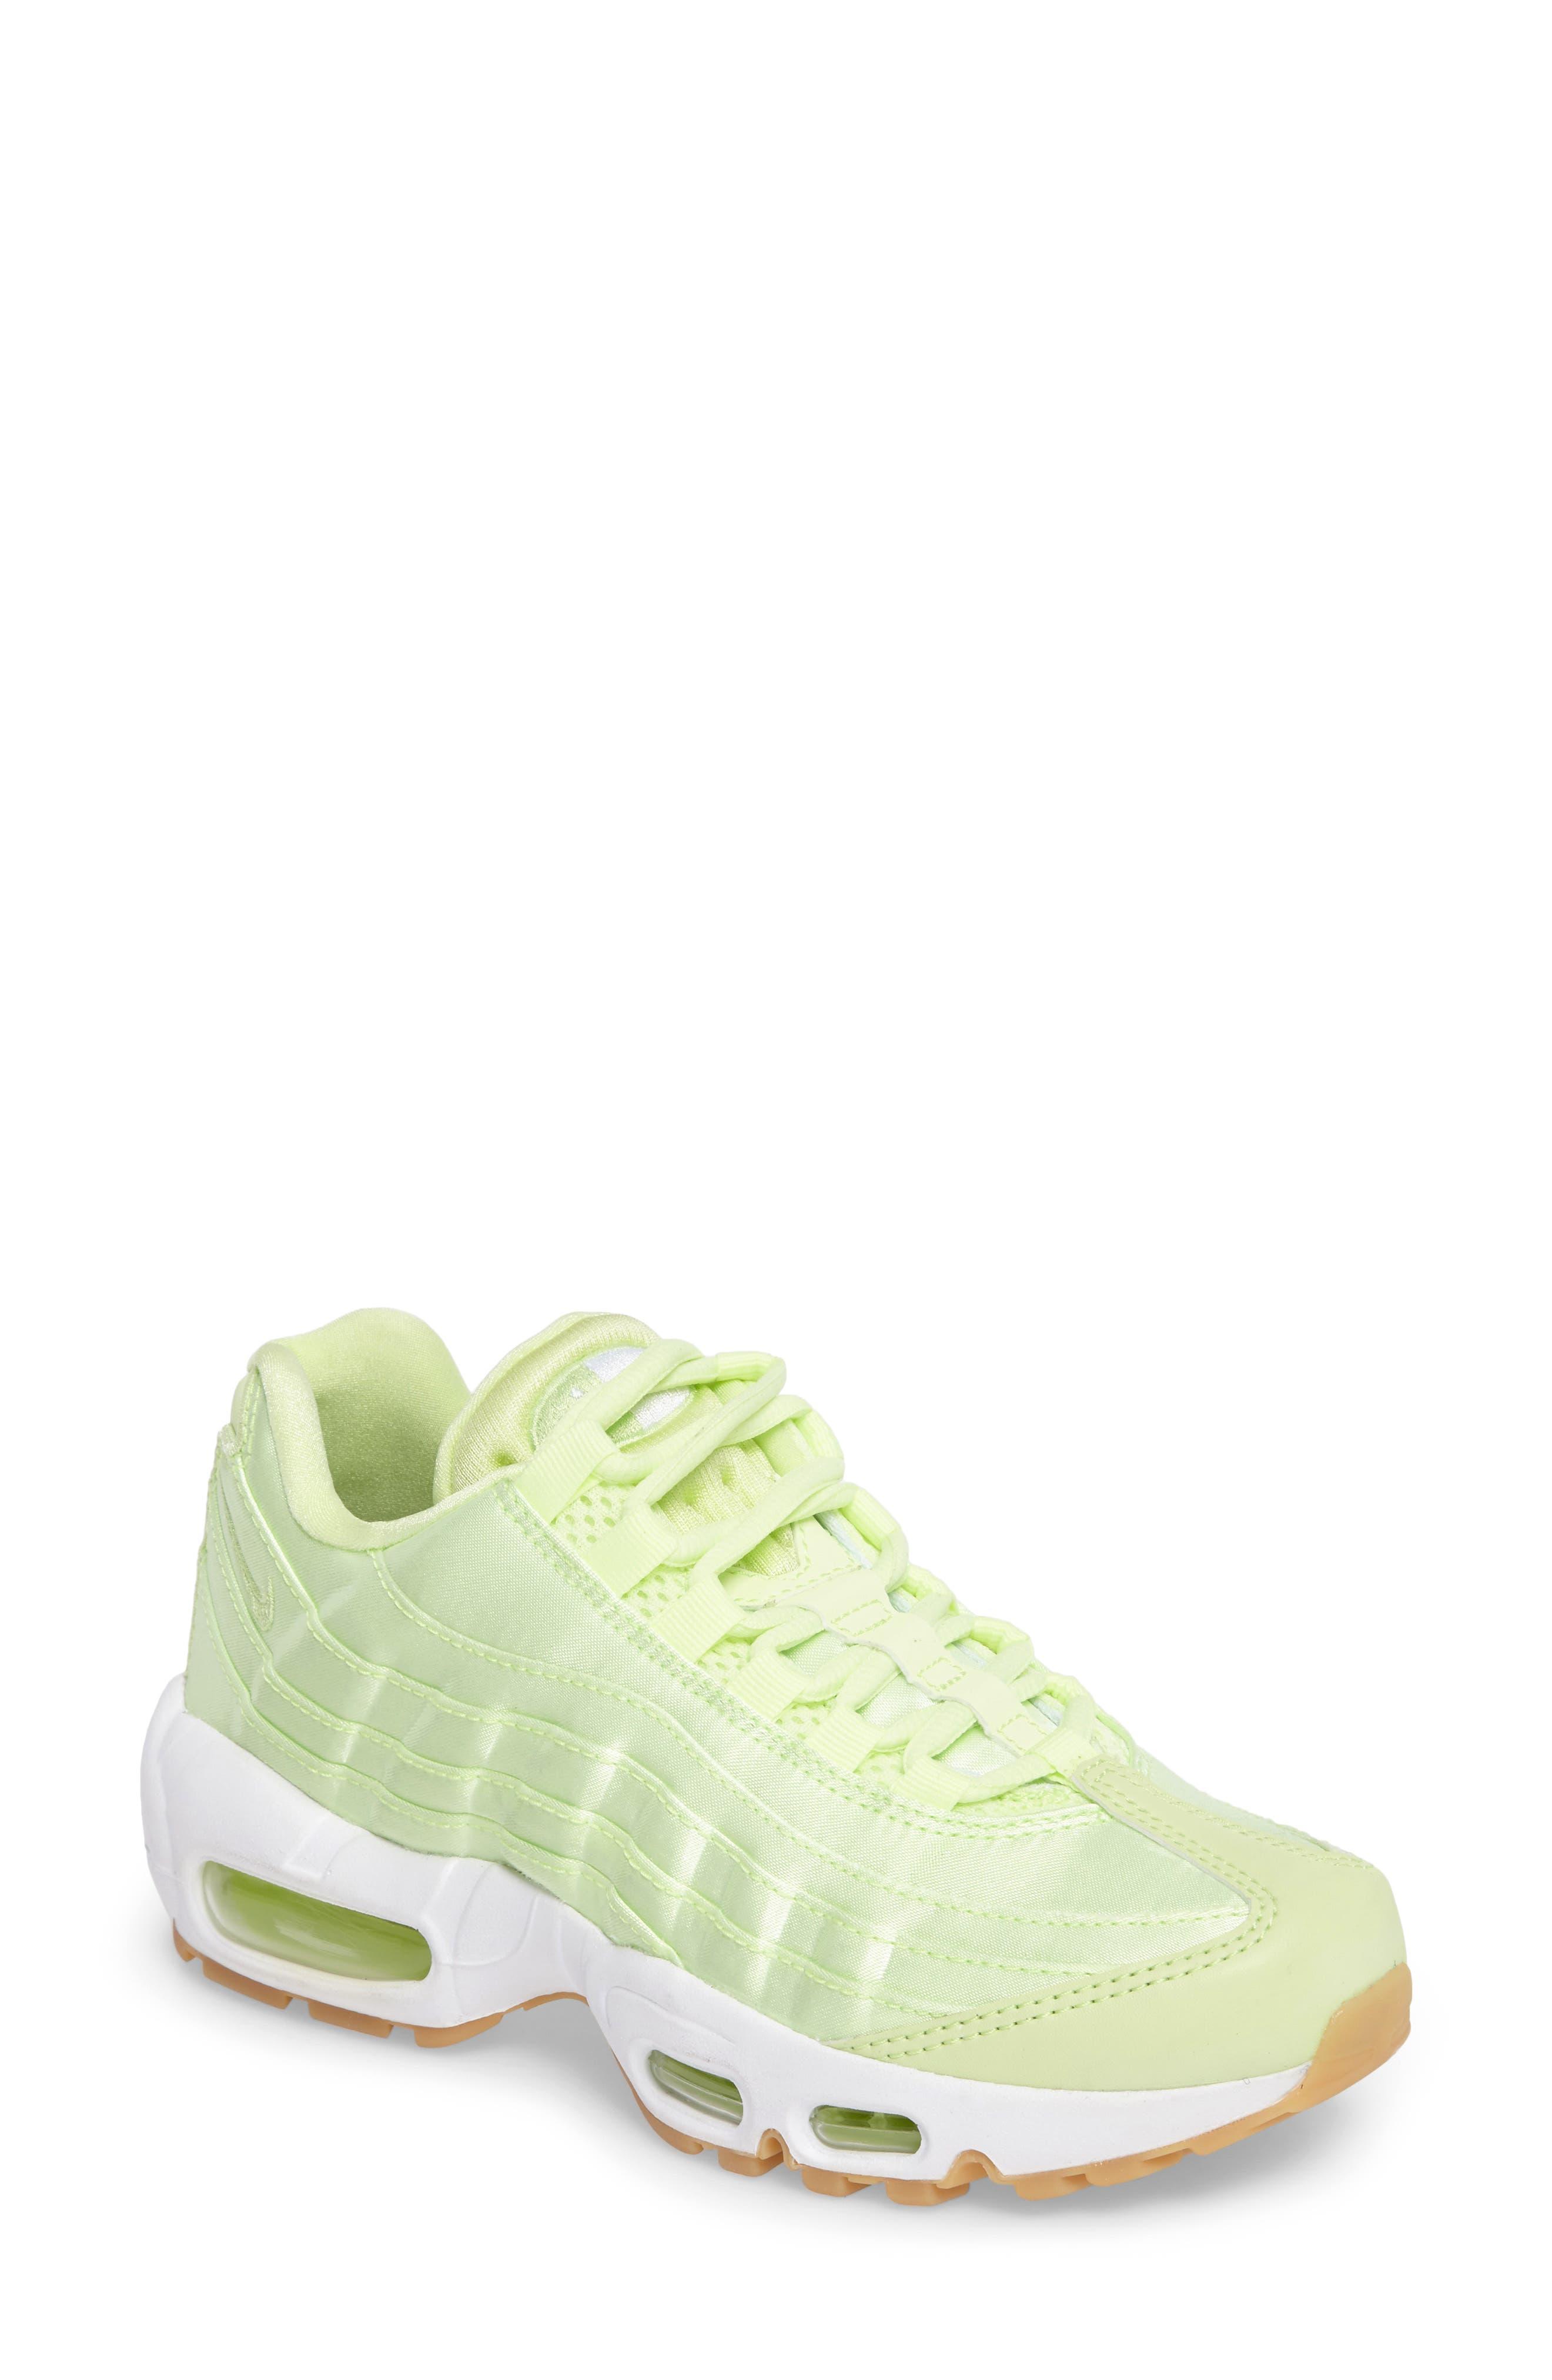 Alternate Image 1 Selected - Nike Air Max 95 QS Running Shoe (Women)